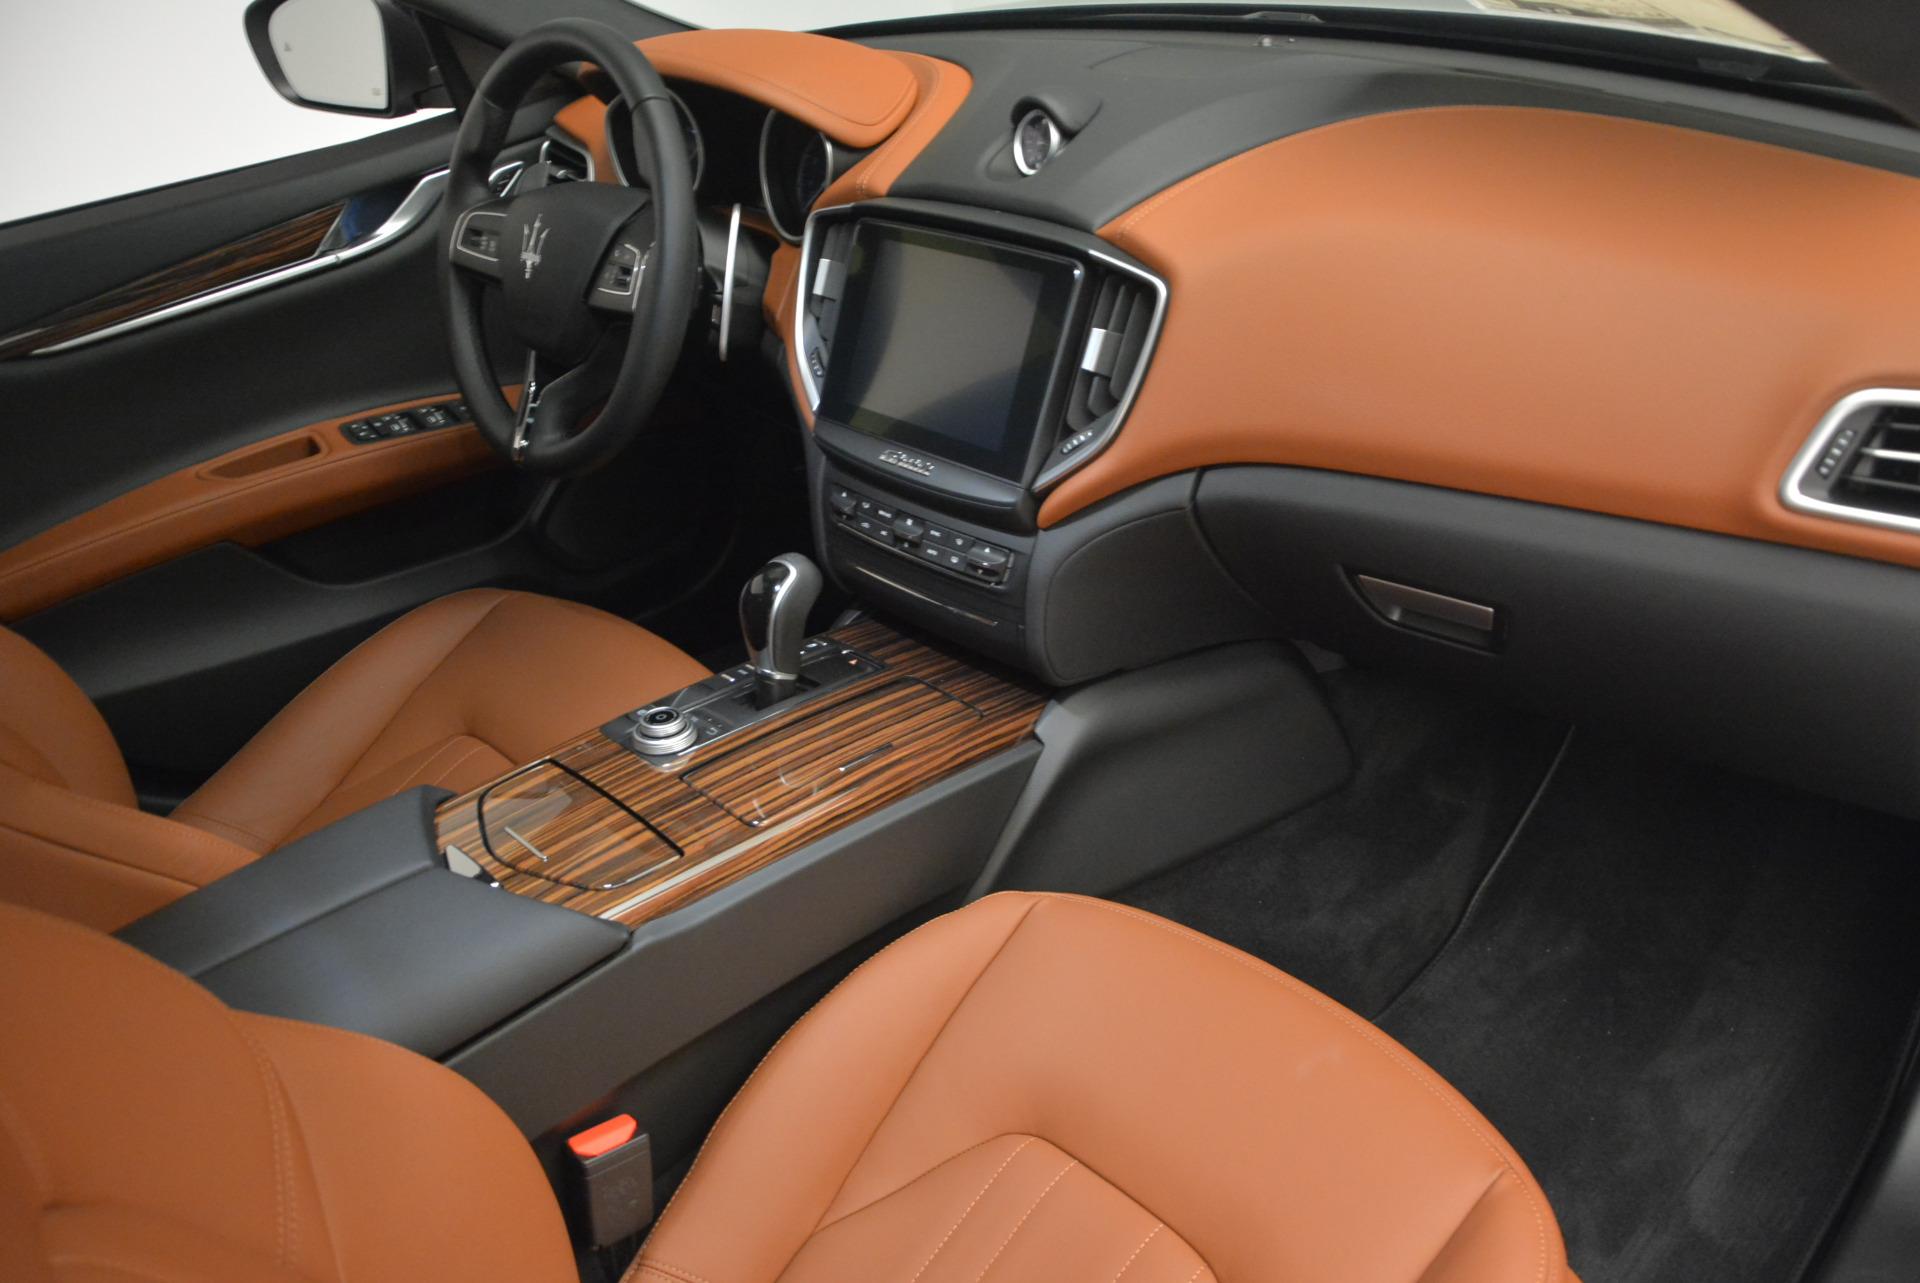 Used 2017 Maserati Ghibli S Q4 - EX Loaner For Sale In Greenwich, CT. Alfa Romeo of Greenwich, M1662 568_p19